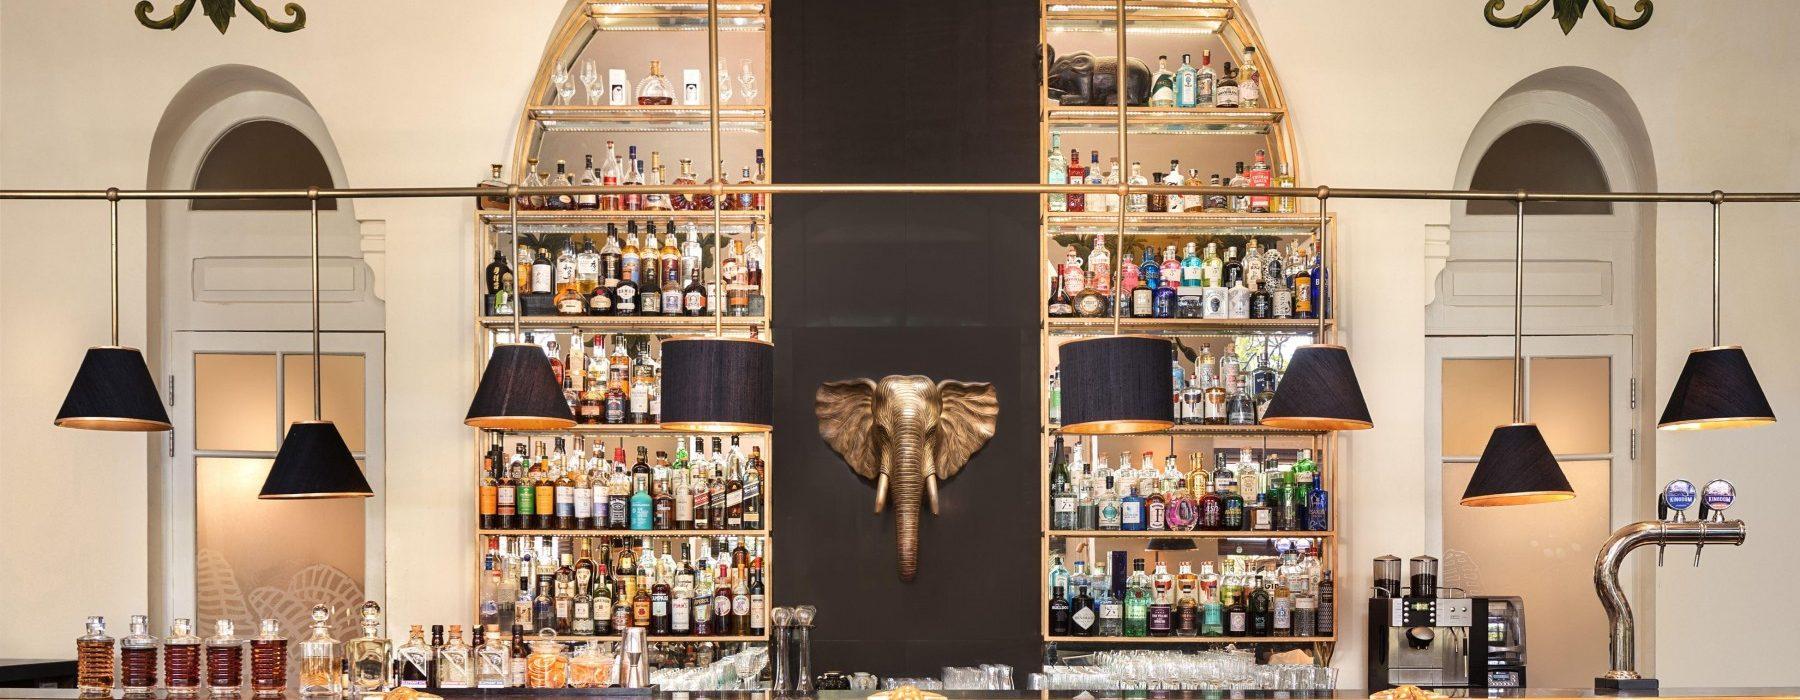 Raffles Hotel Le Royal Phnom Penh - Happy Hour at The Elephant Bar